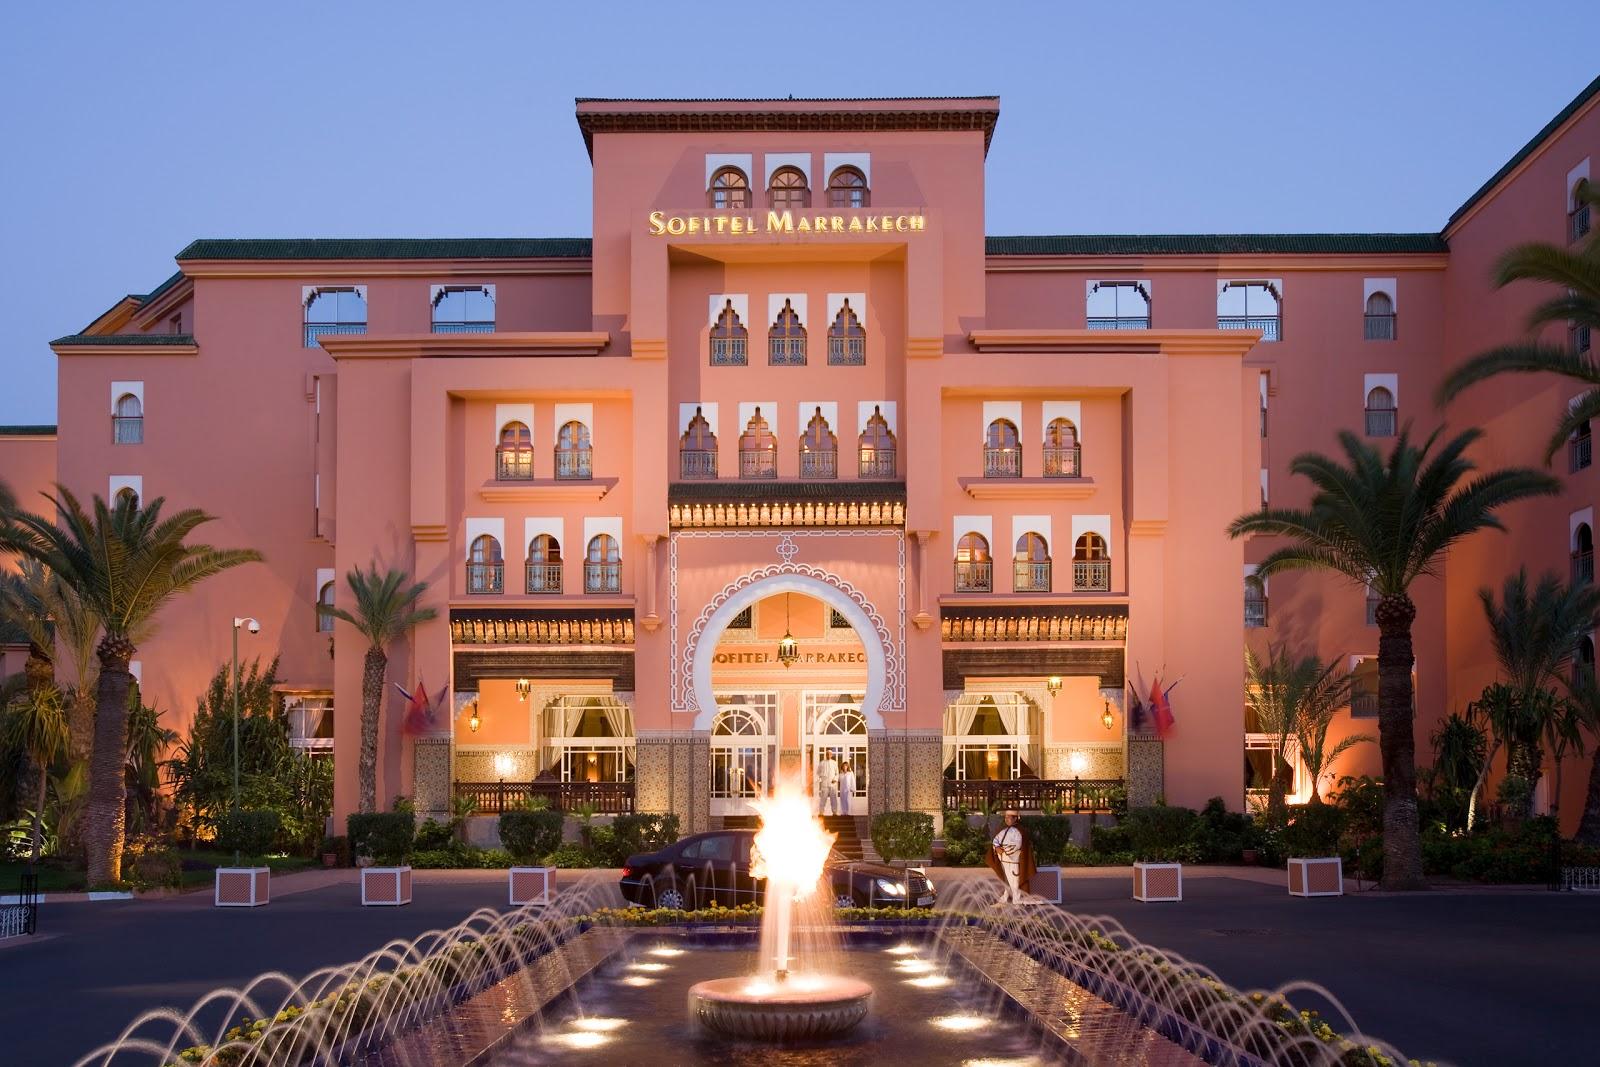 Hotel Sofitel A Marrakech